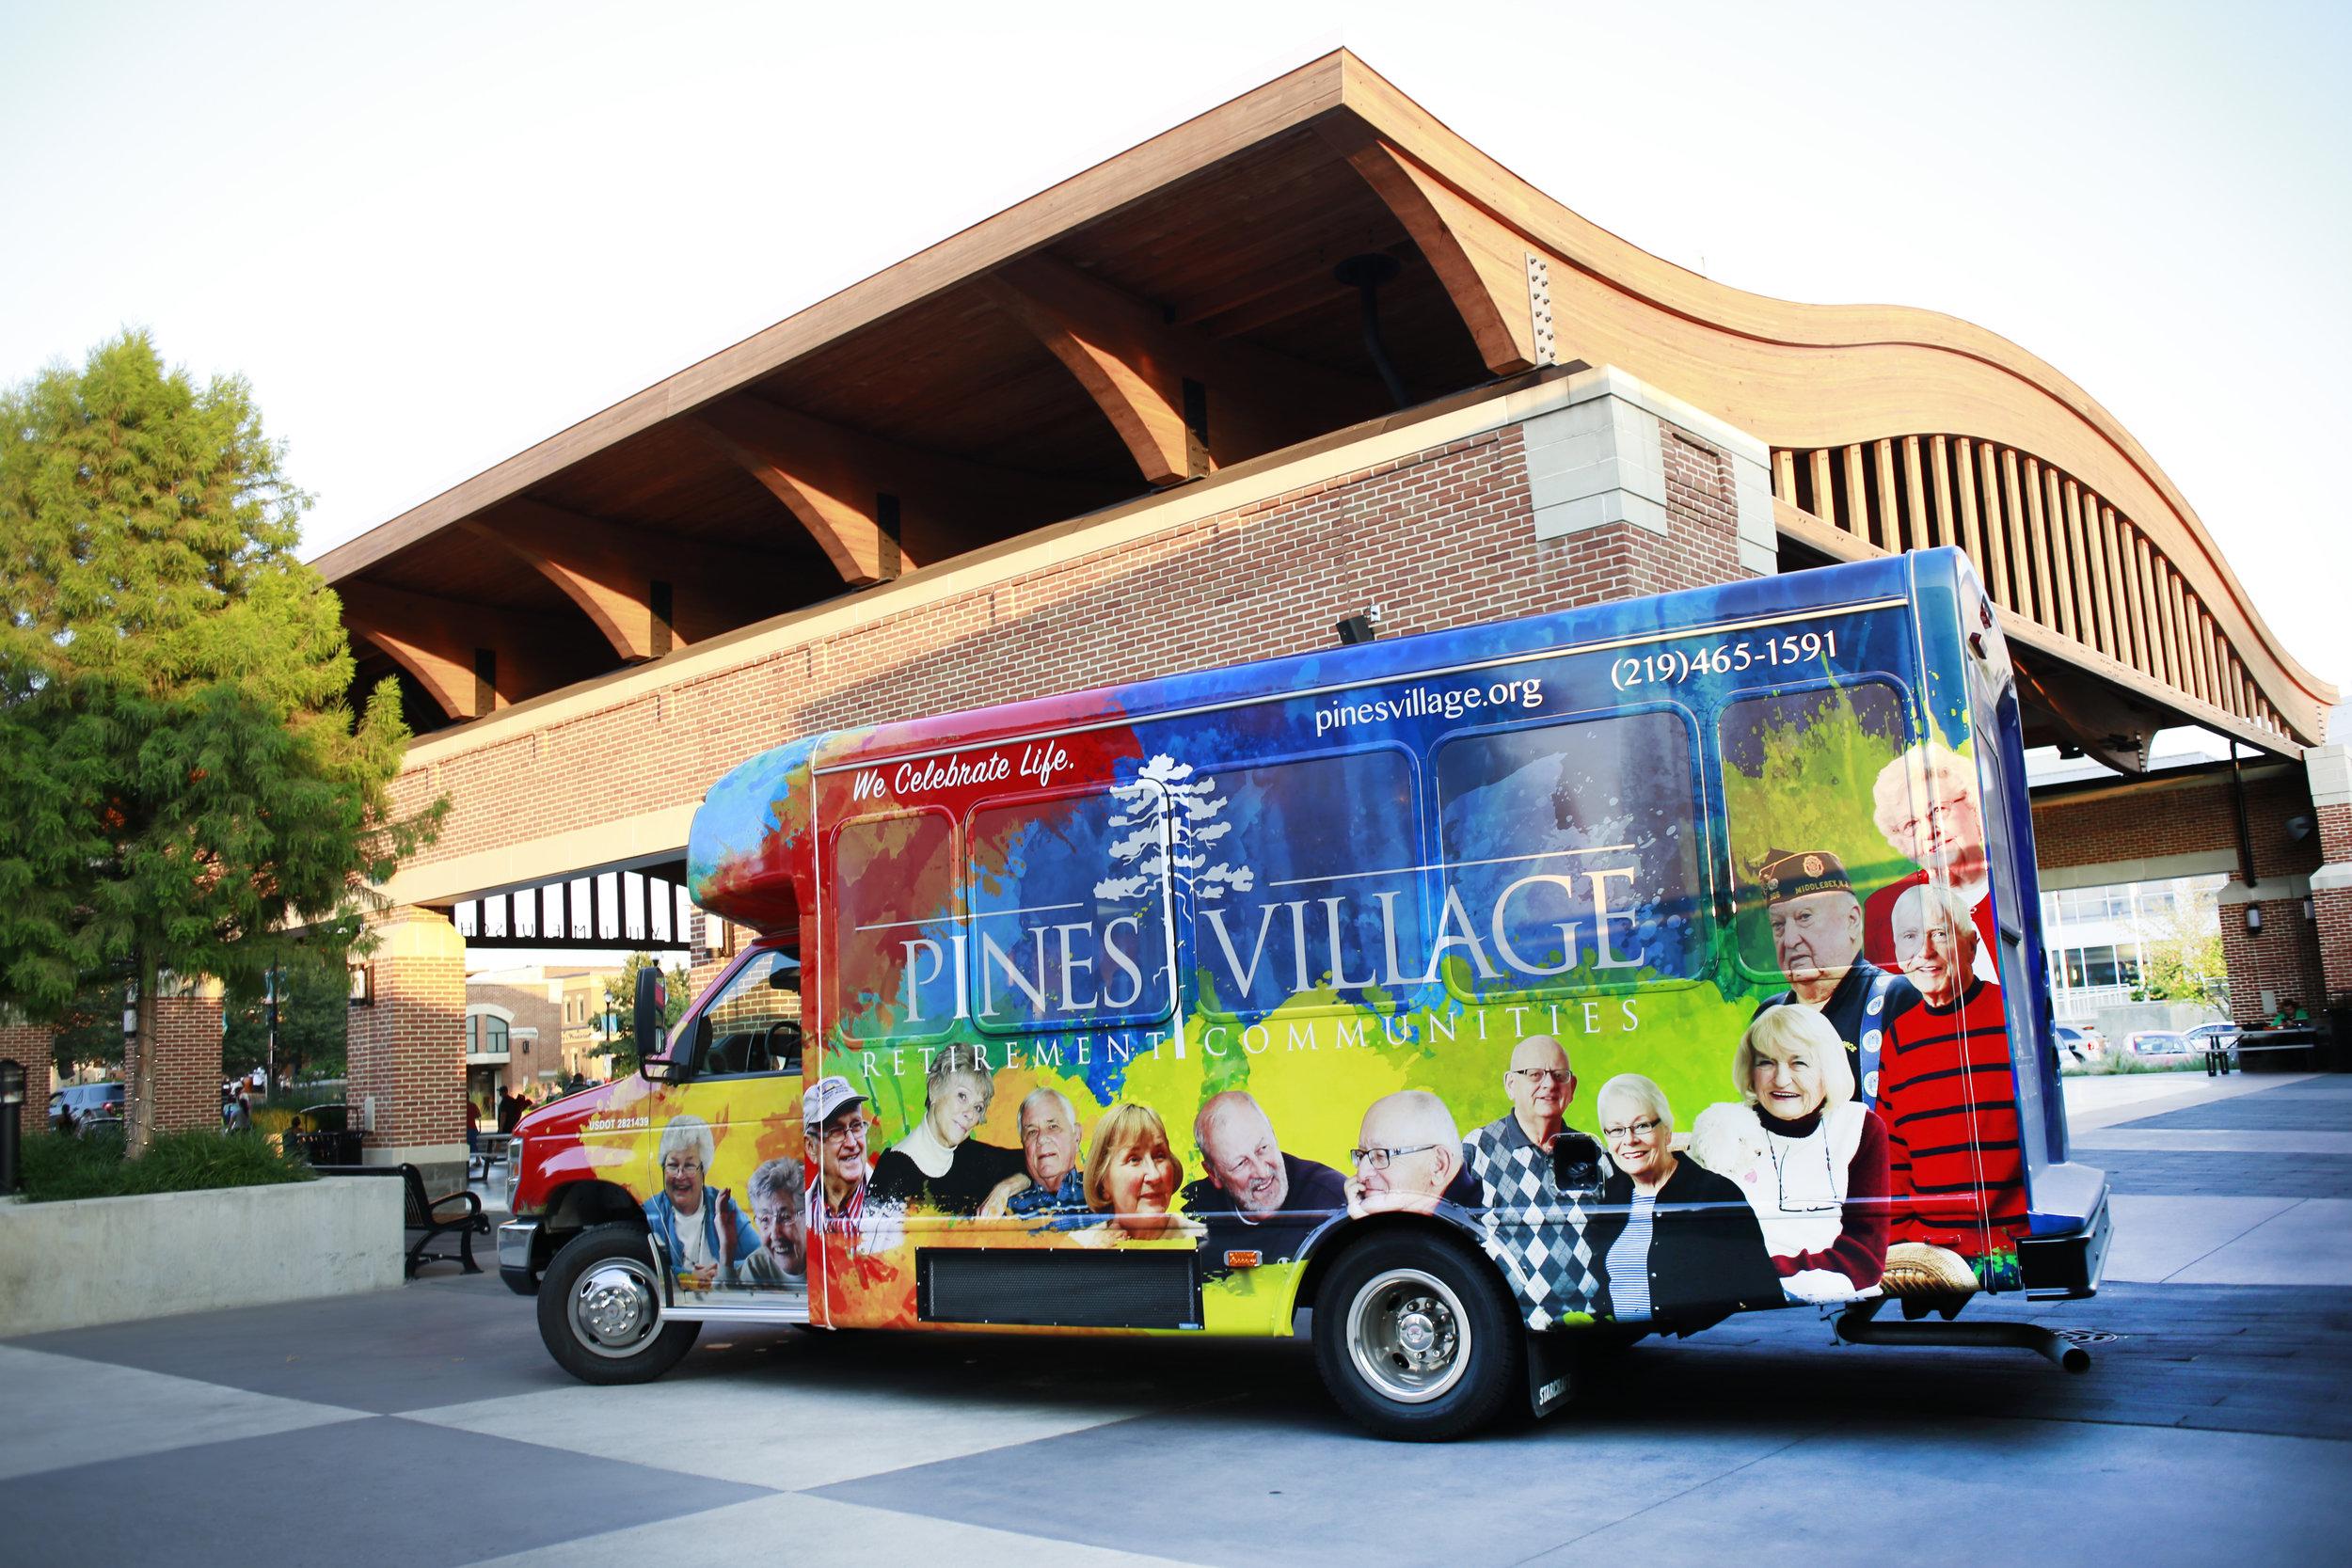 PinesVillage_Bus.JPG